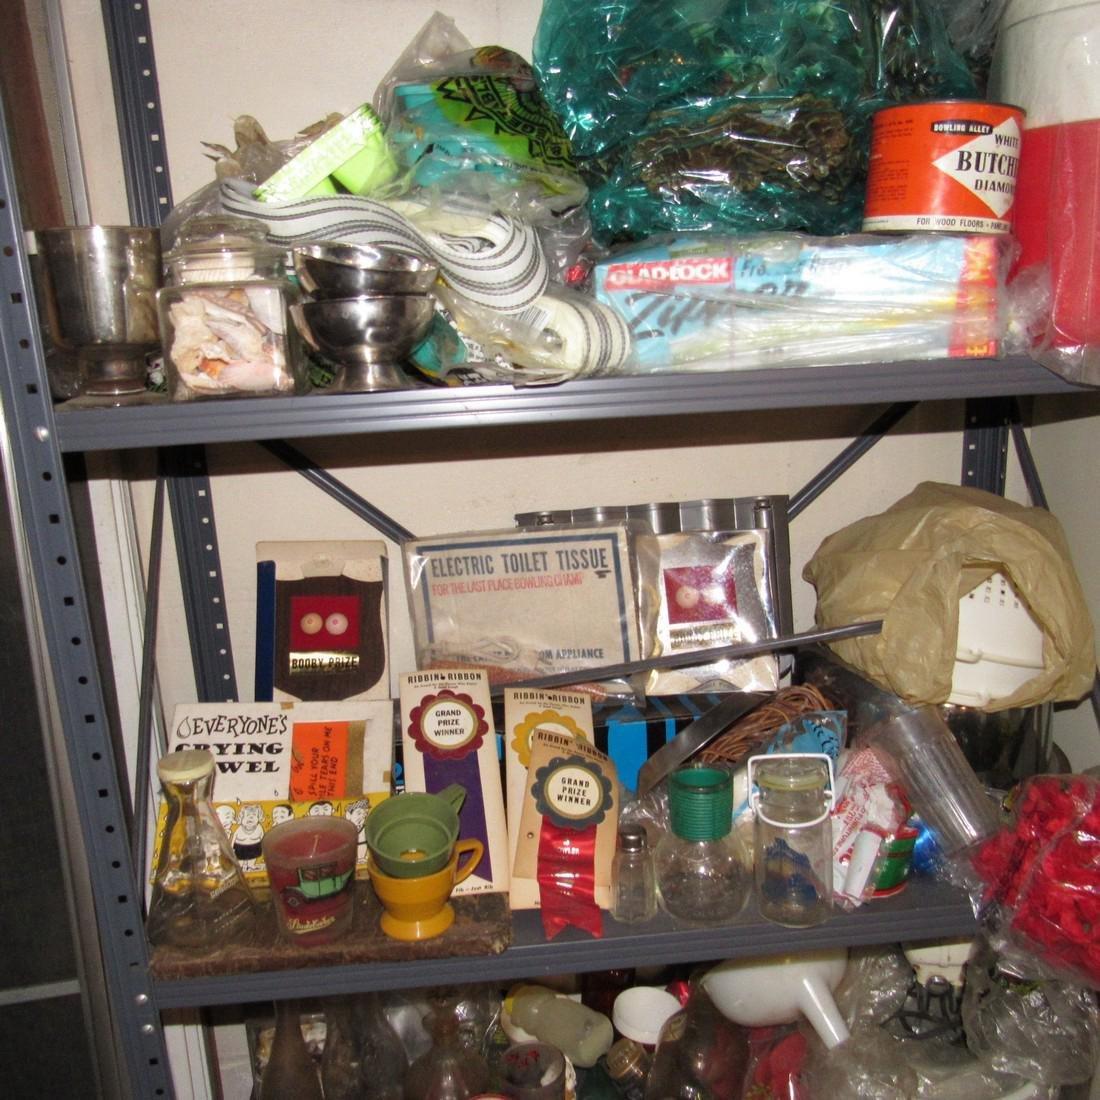 Metal Shelf & Contents - 3